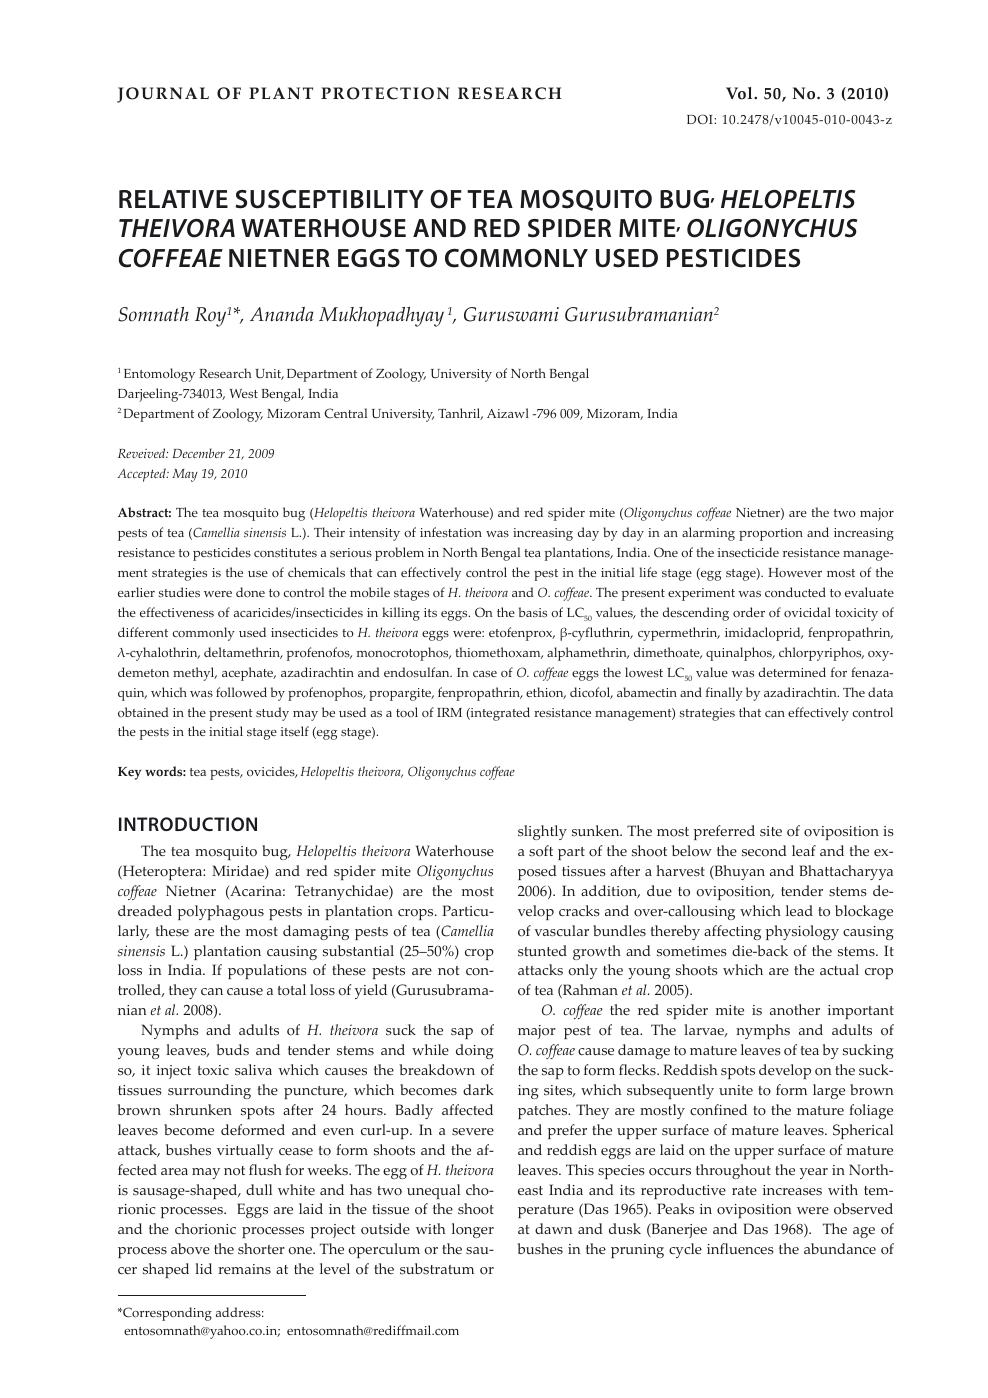 Relative Susceptibility of Tea Mosquito Bug, Helopeltis